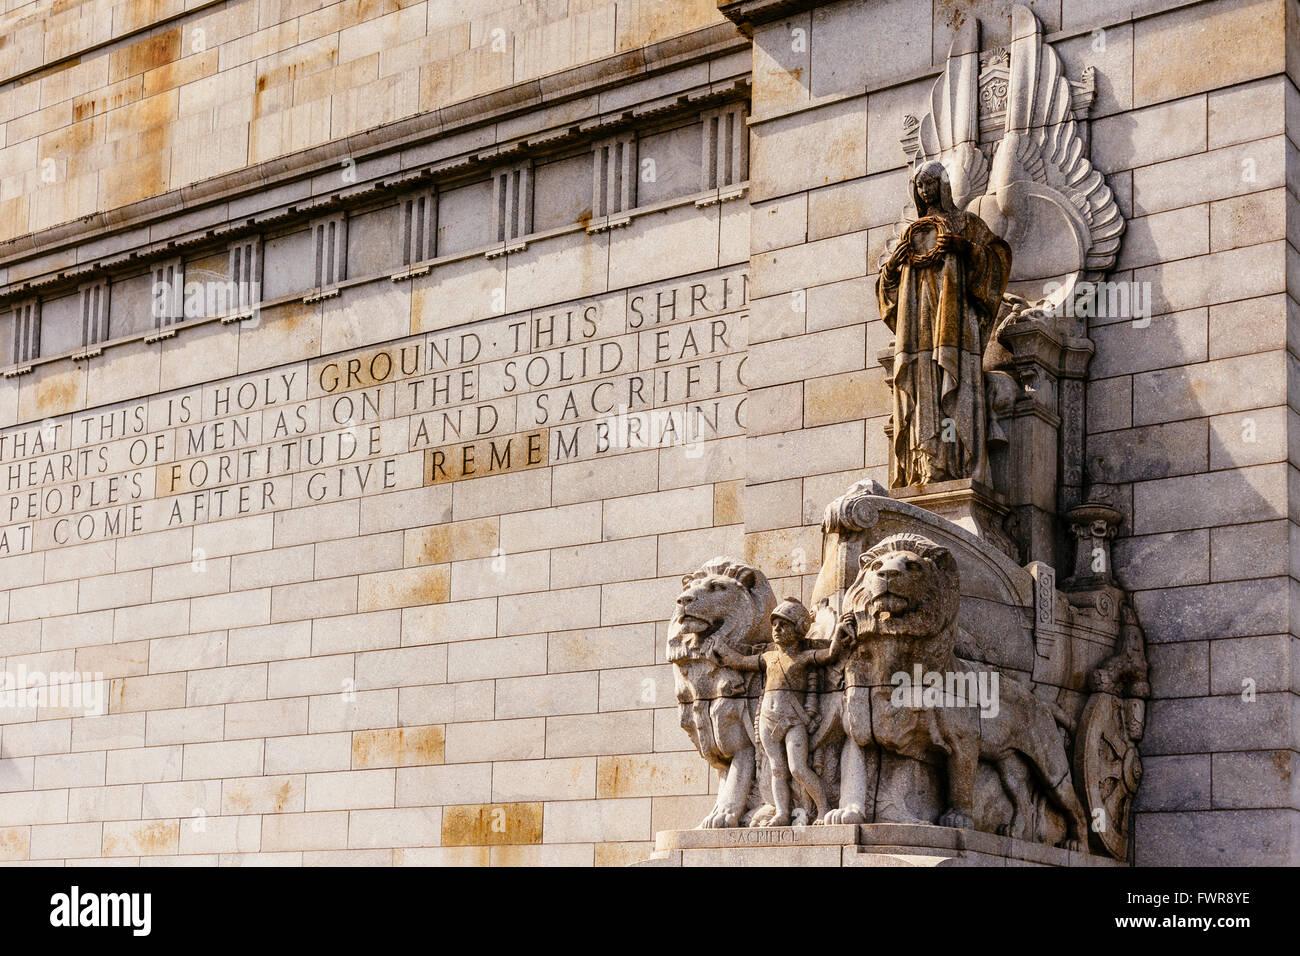 Western Wall, Shrine of Remembrance, Melbourne, Victoria, Australia - Stock Image